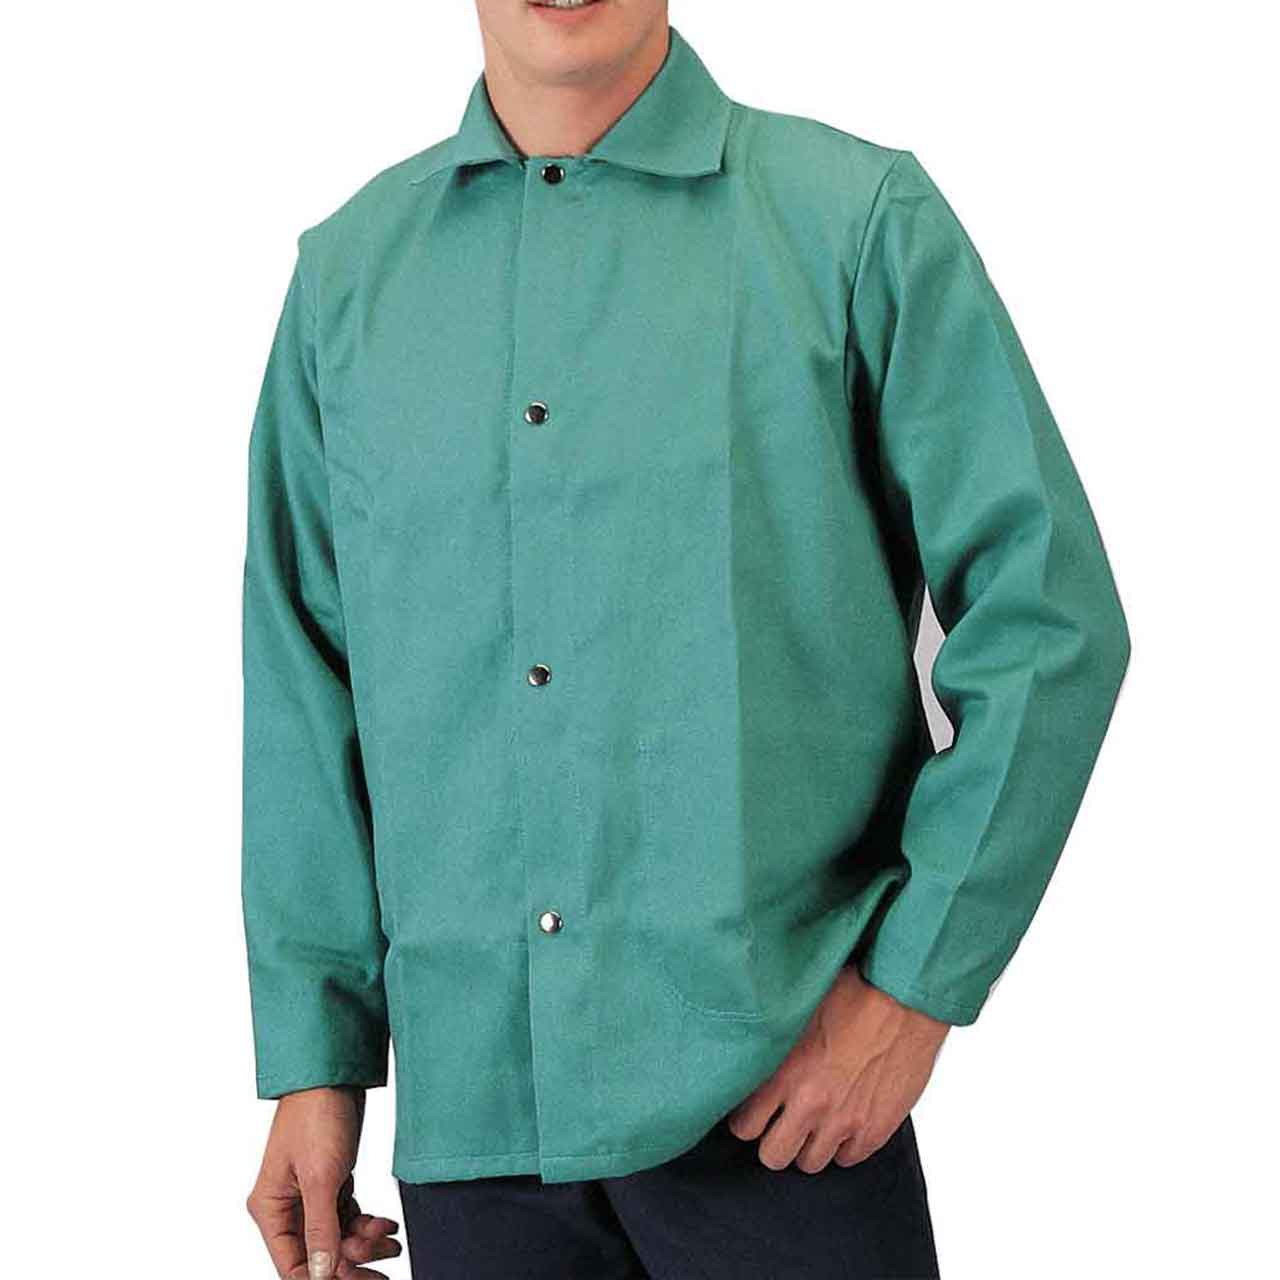 "Tillman 6230 30"" 9 oz. Green FR Cotton Welding Jacket, Large"